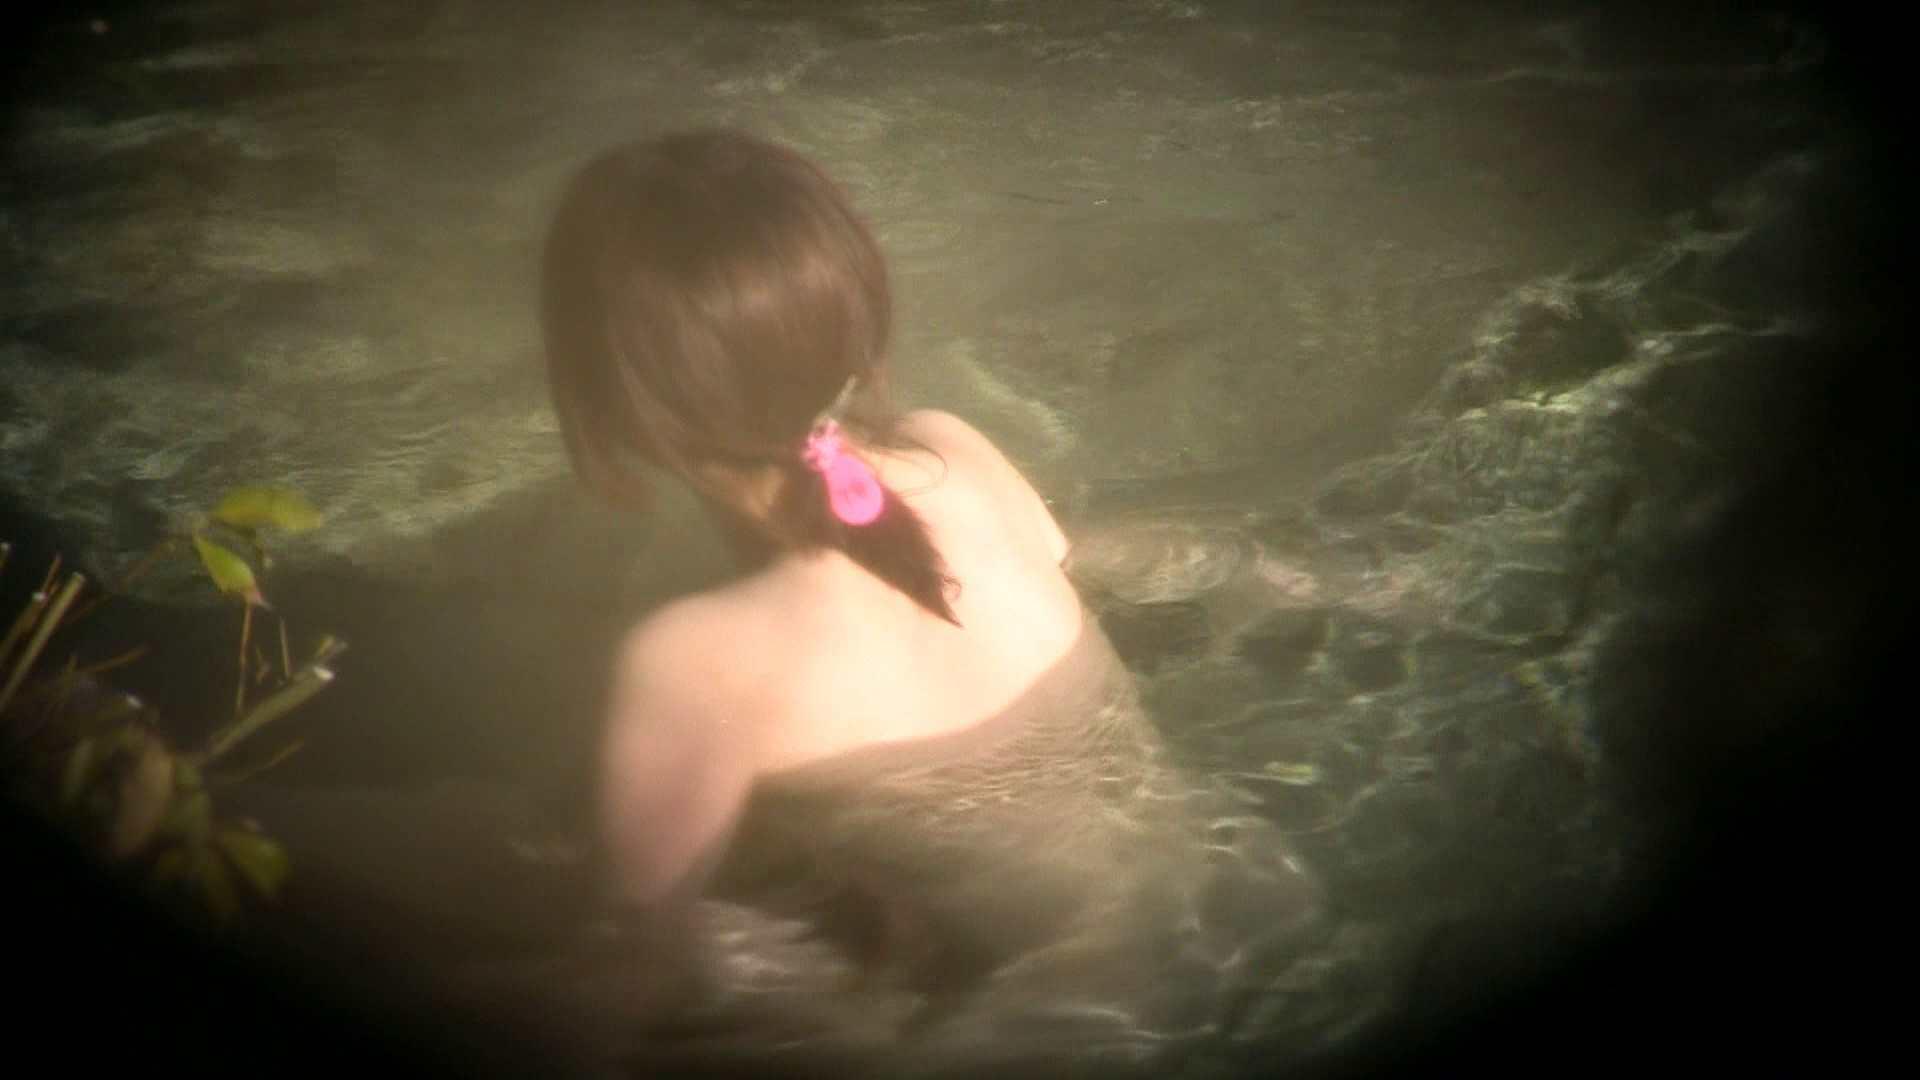 Aquaな露天風呂Vol.698 盗撮 | HなOL  86pic 47